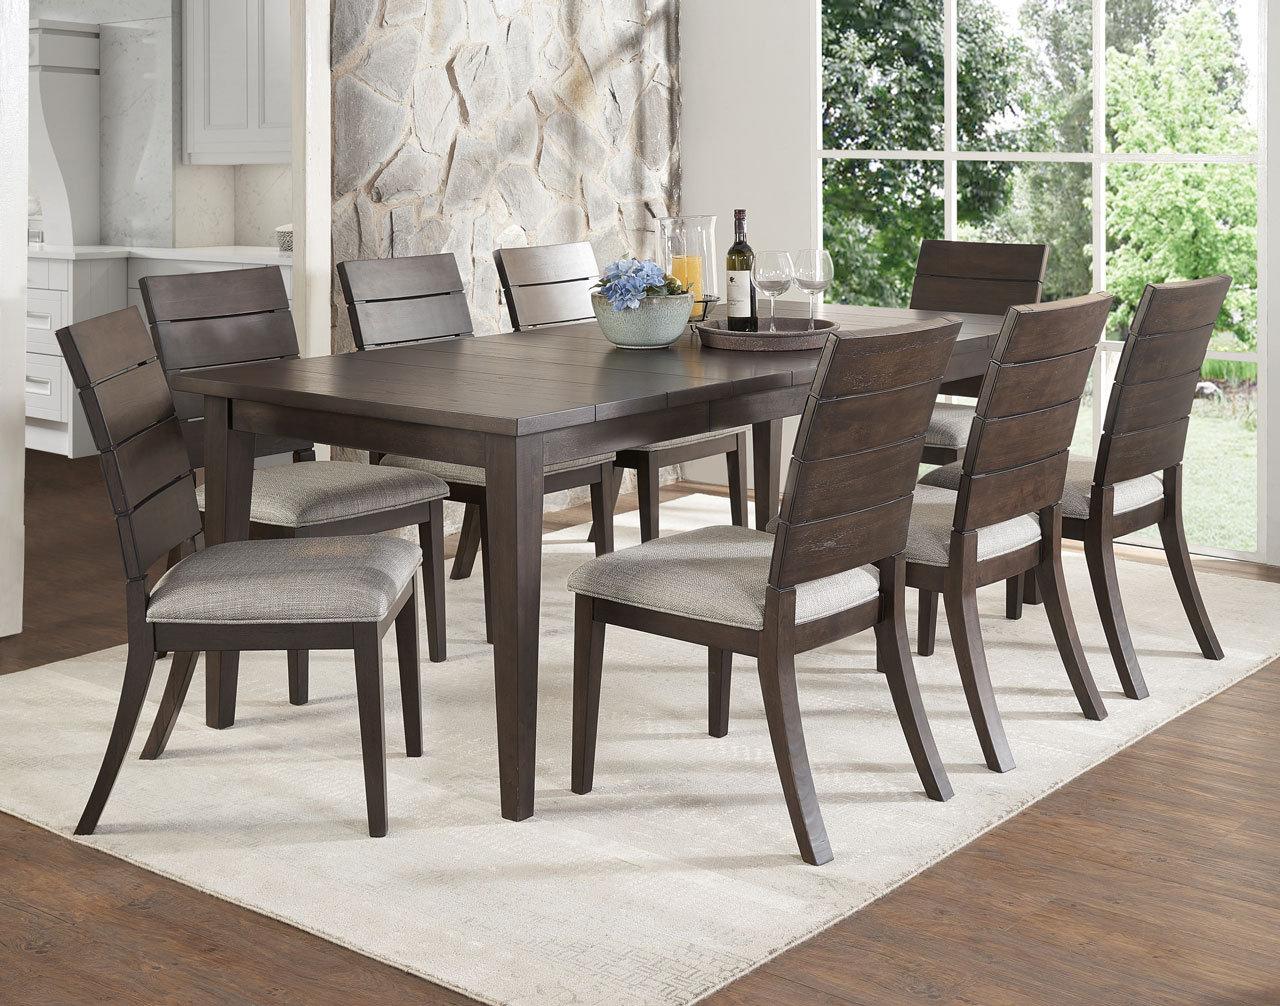 Gracie Oaks Wooton 9 Piece Extendable Dining Table Set Reviews Wayfair